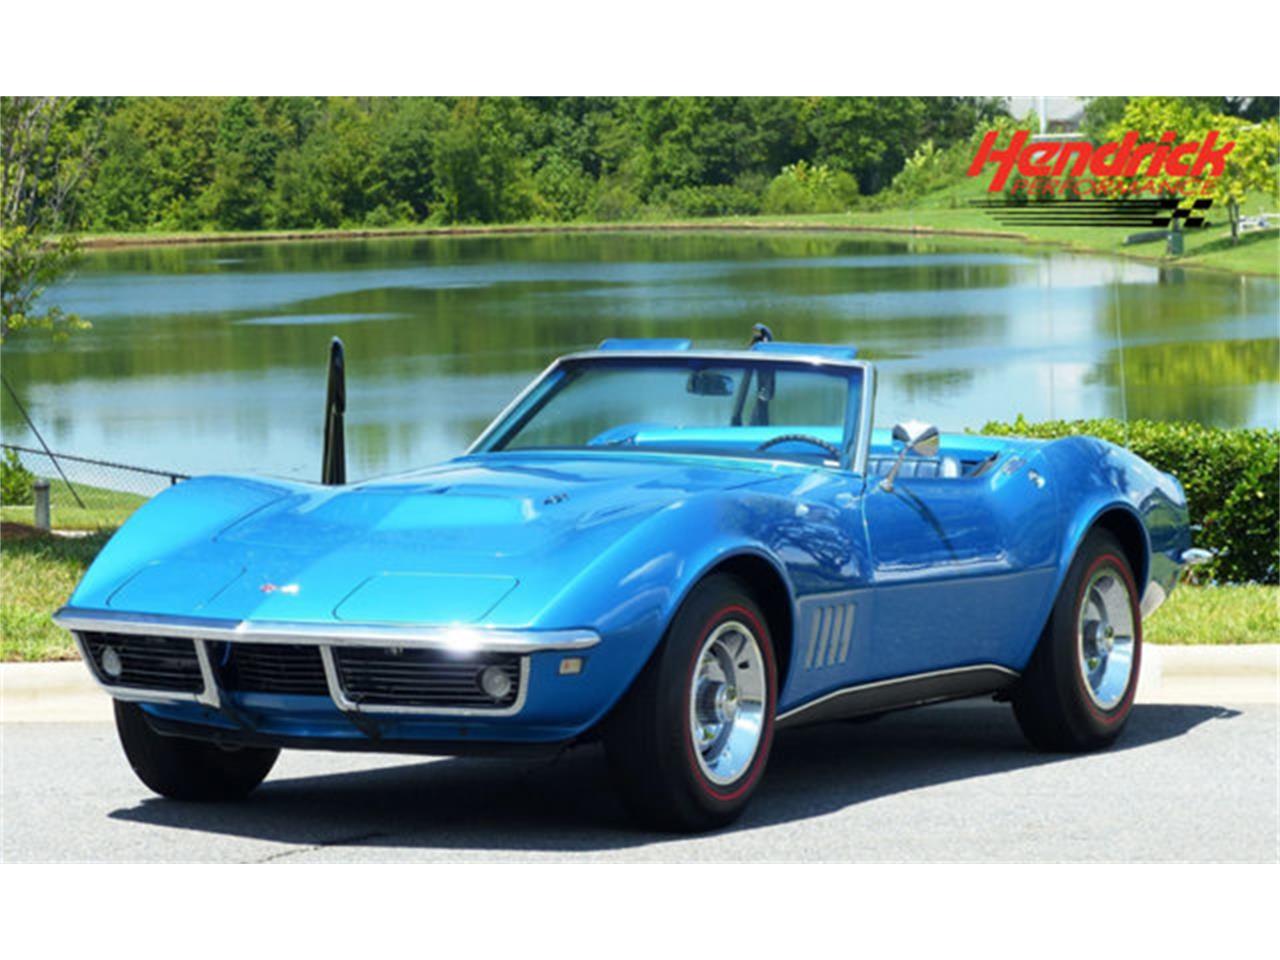 1968 Chevrolet Corvette for Sale on ClassicCars.com